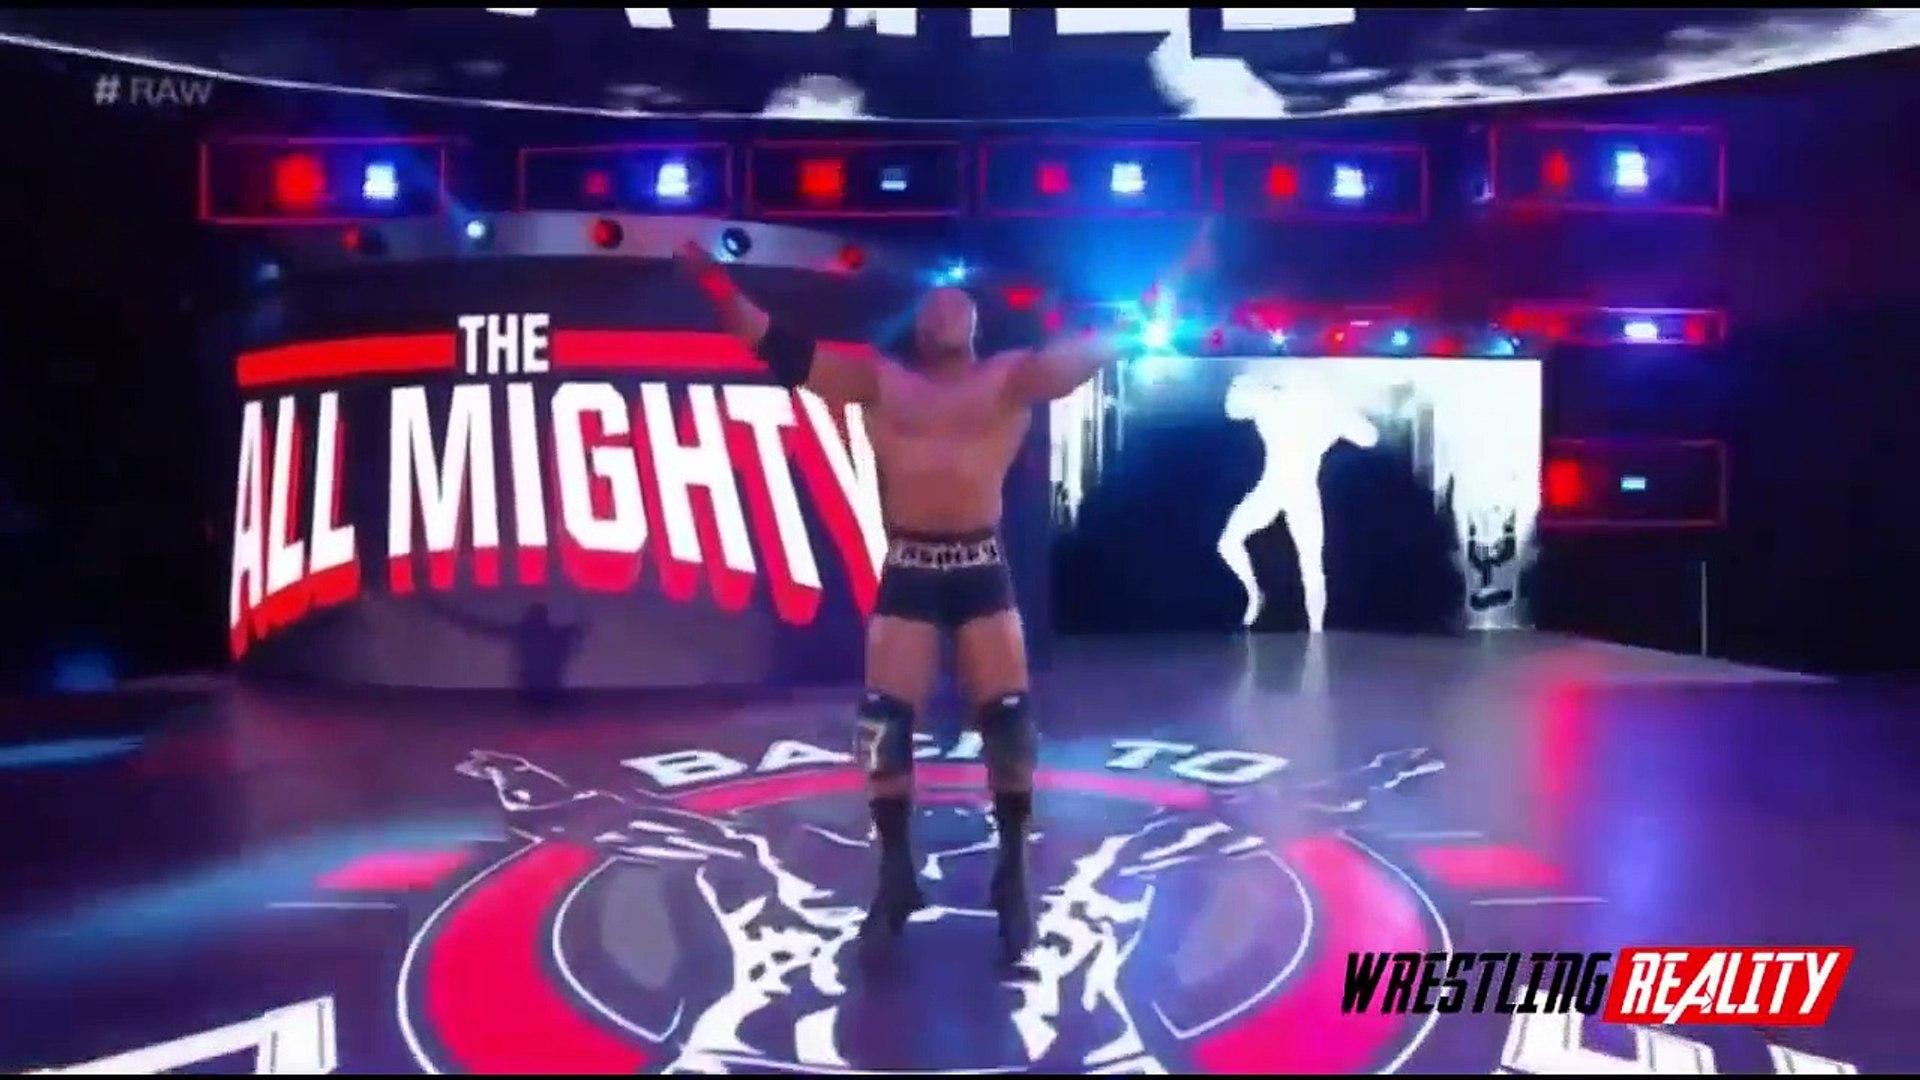 WWE Raw Highlights 06_05_2019 HD - WWE Raw Highlights 6th May 2019 HD